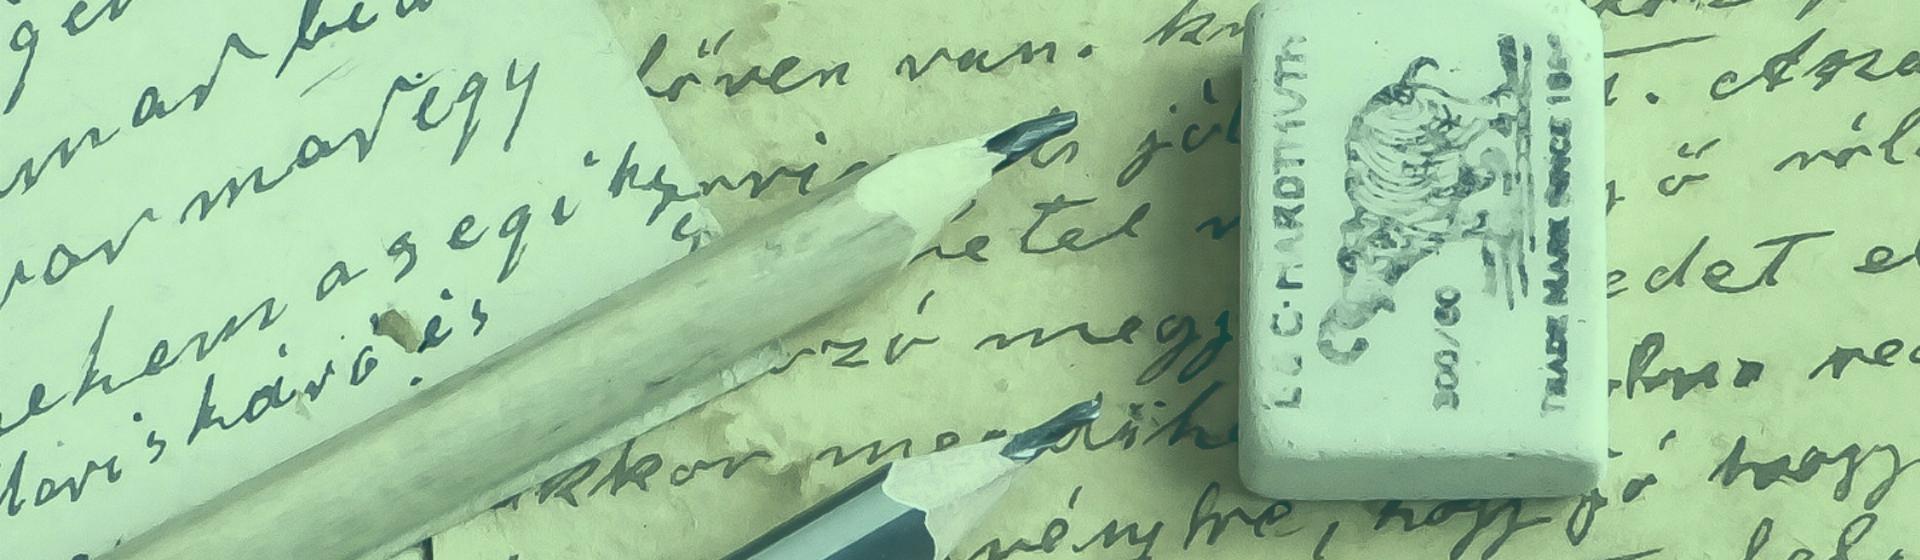 5 estrategias de escritura creativa para escribir como García Márquez